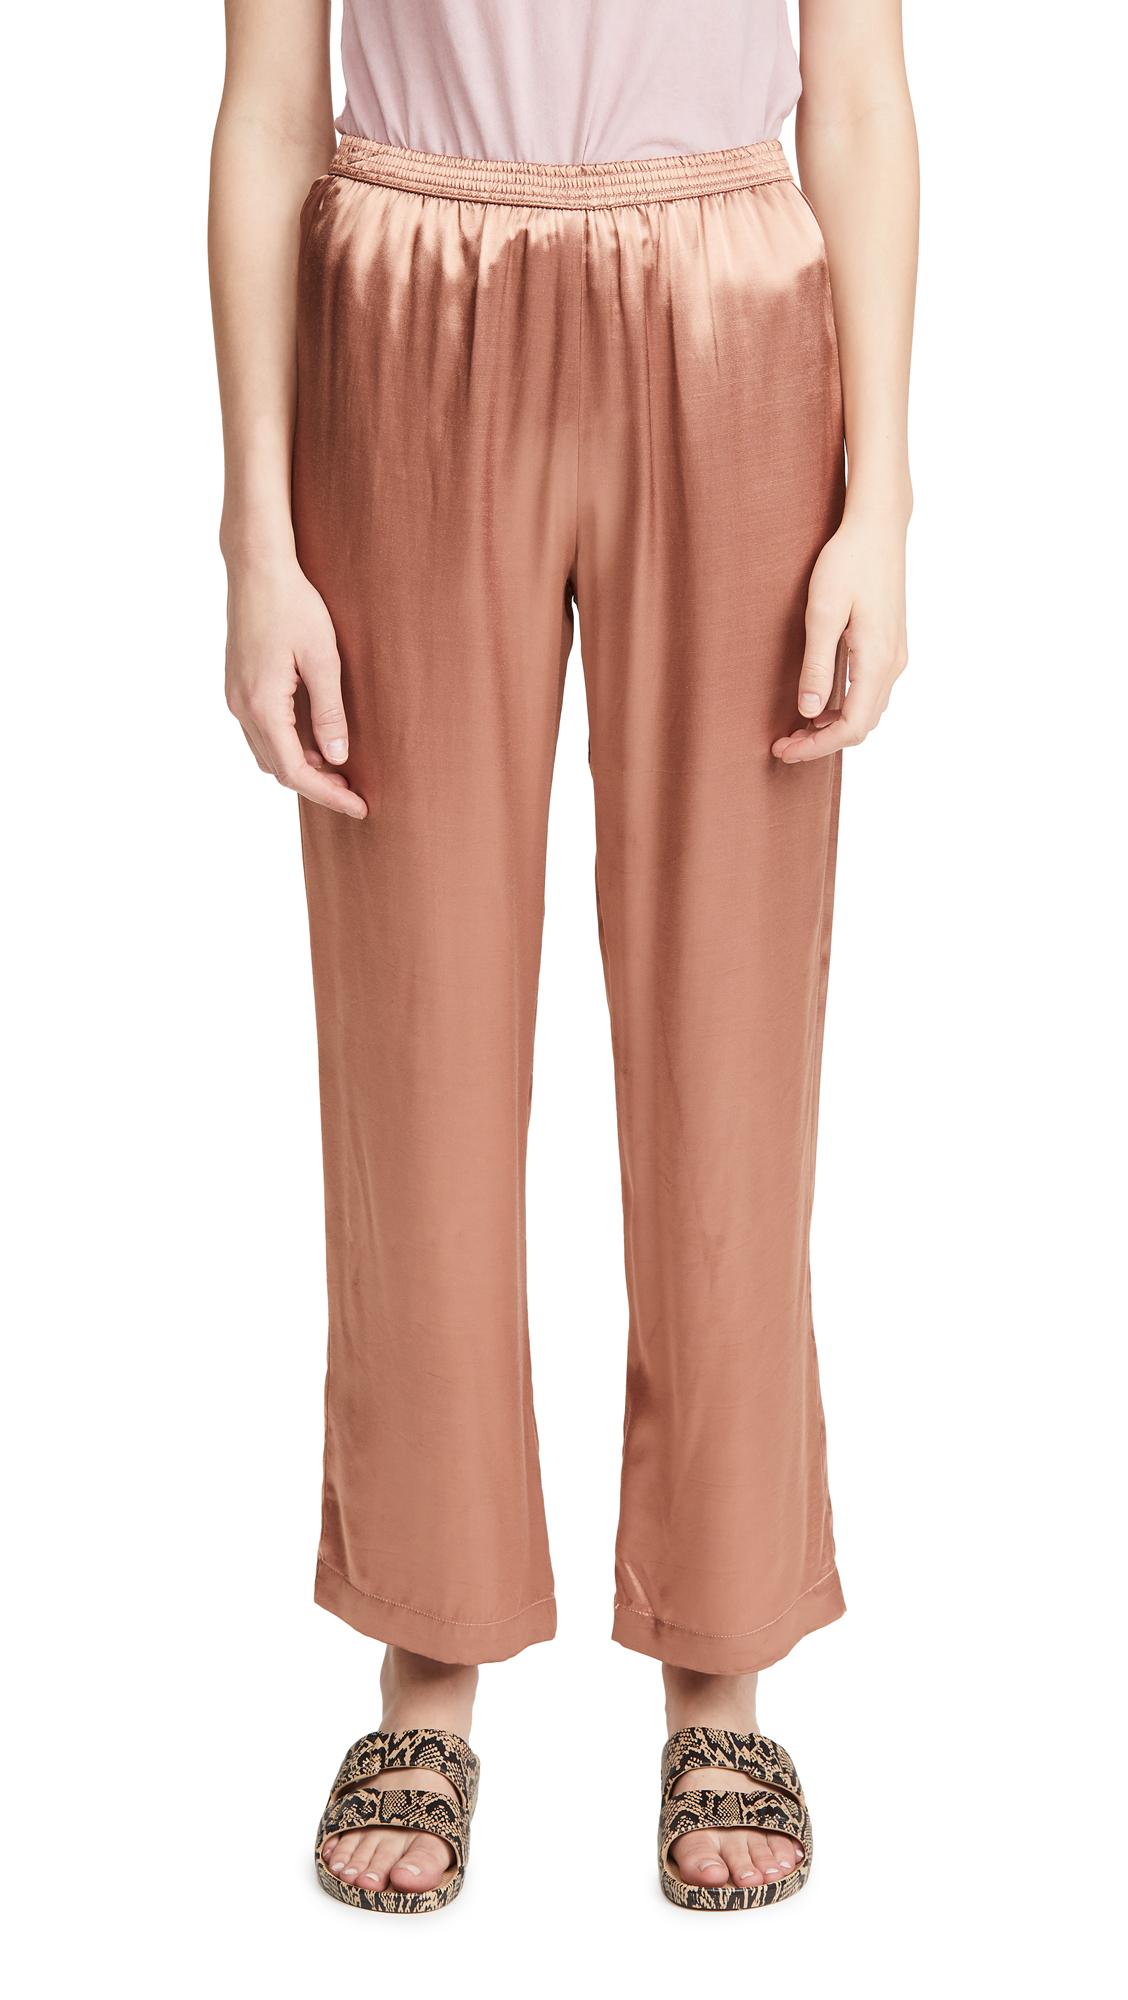 Enza Costa Satin Lounge Pants